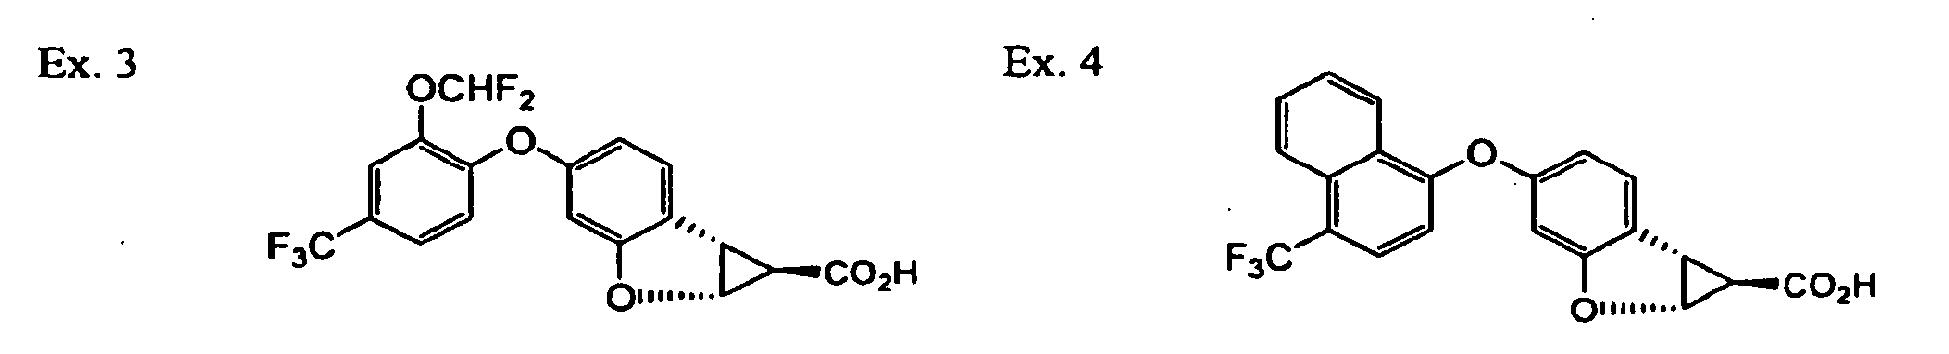 Figure imgb0168